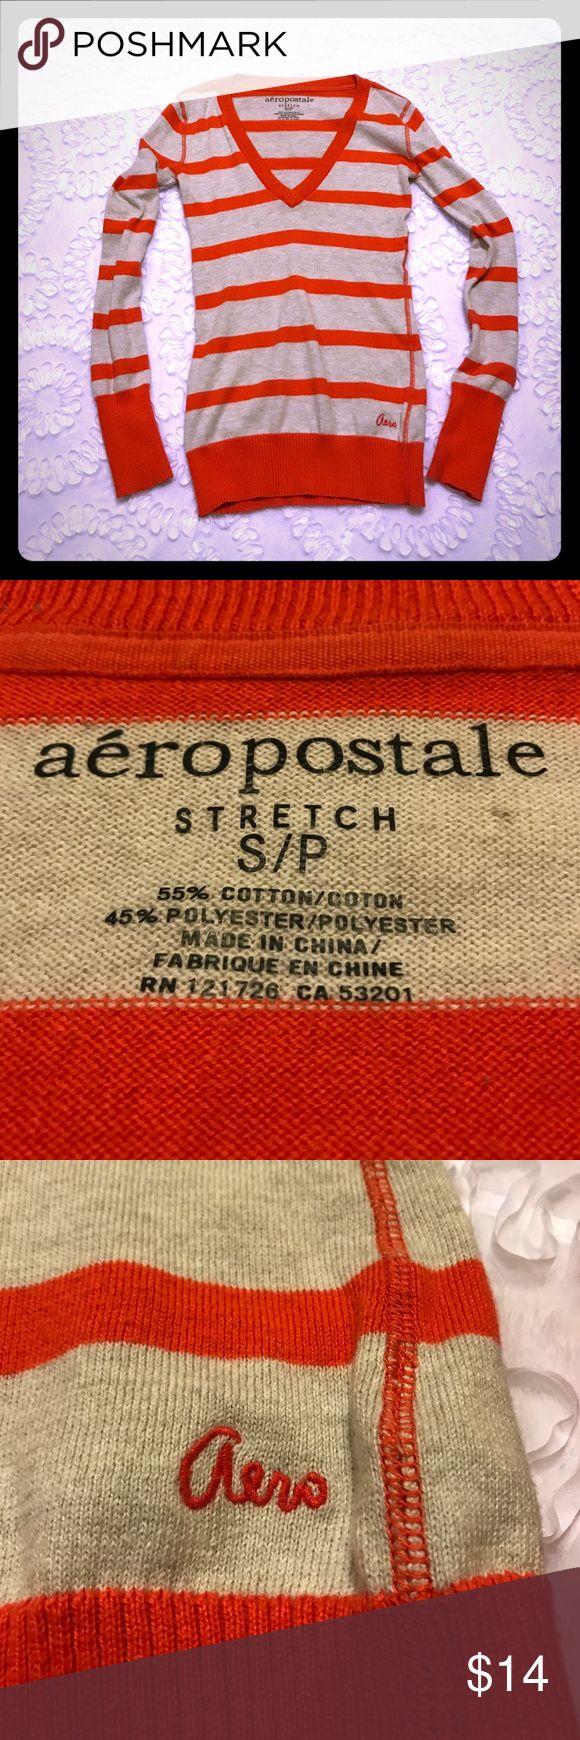 Aeropostale V-Neck Sweater Size Small V-Neck Aeropostale sweater!  Long torso, long sleeves!  Gently used! Aeropostale Tops Blouses